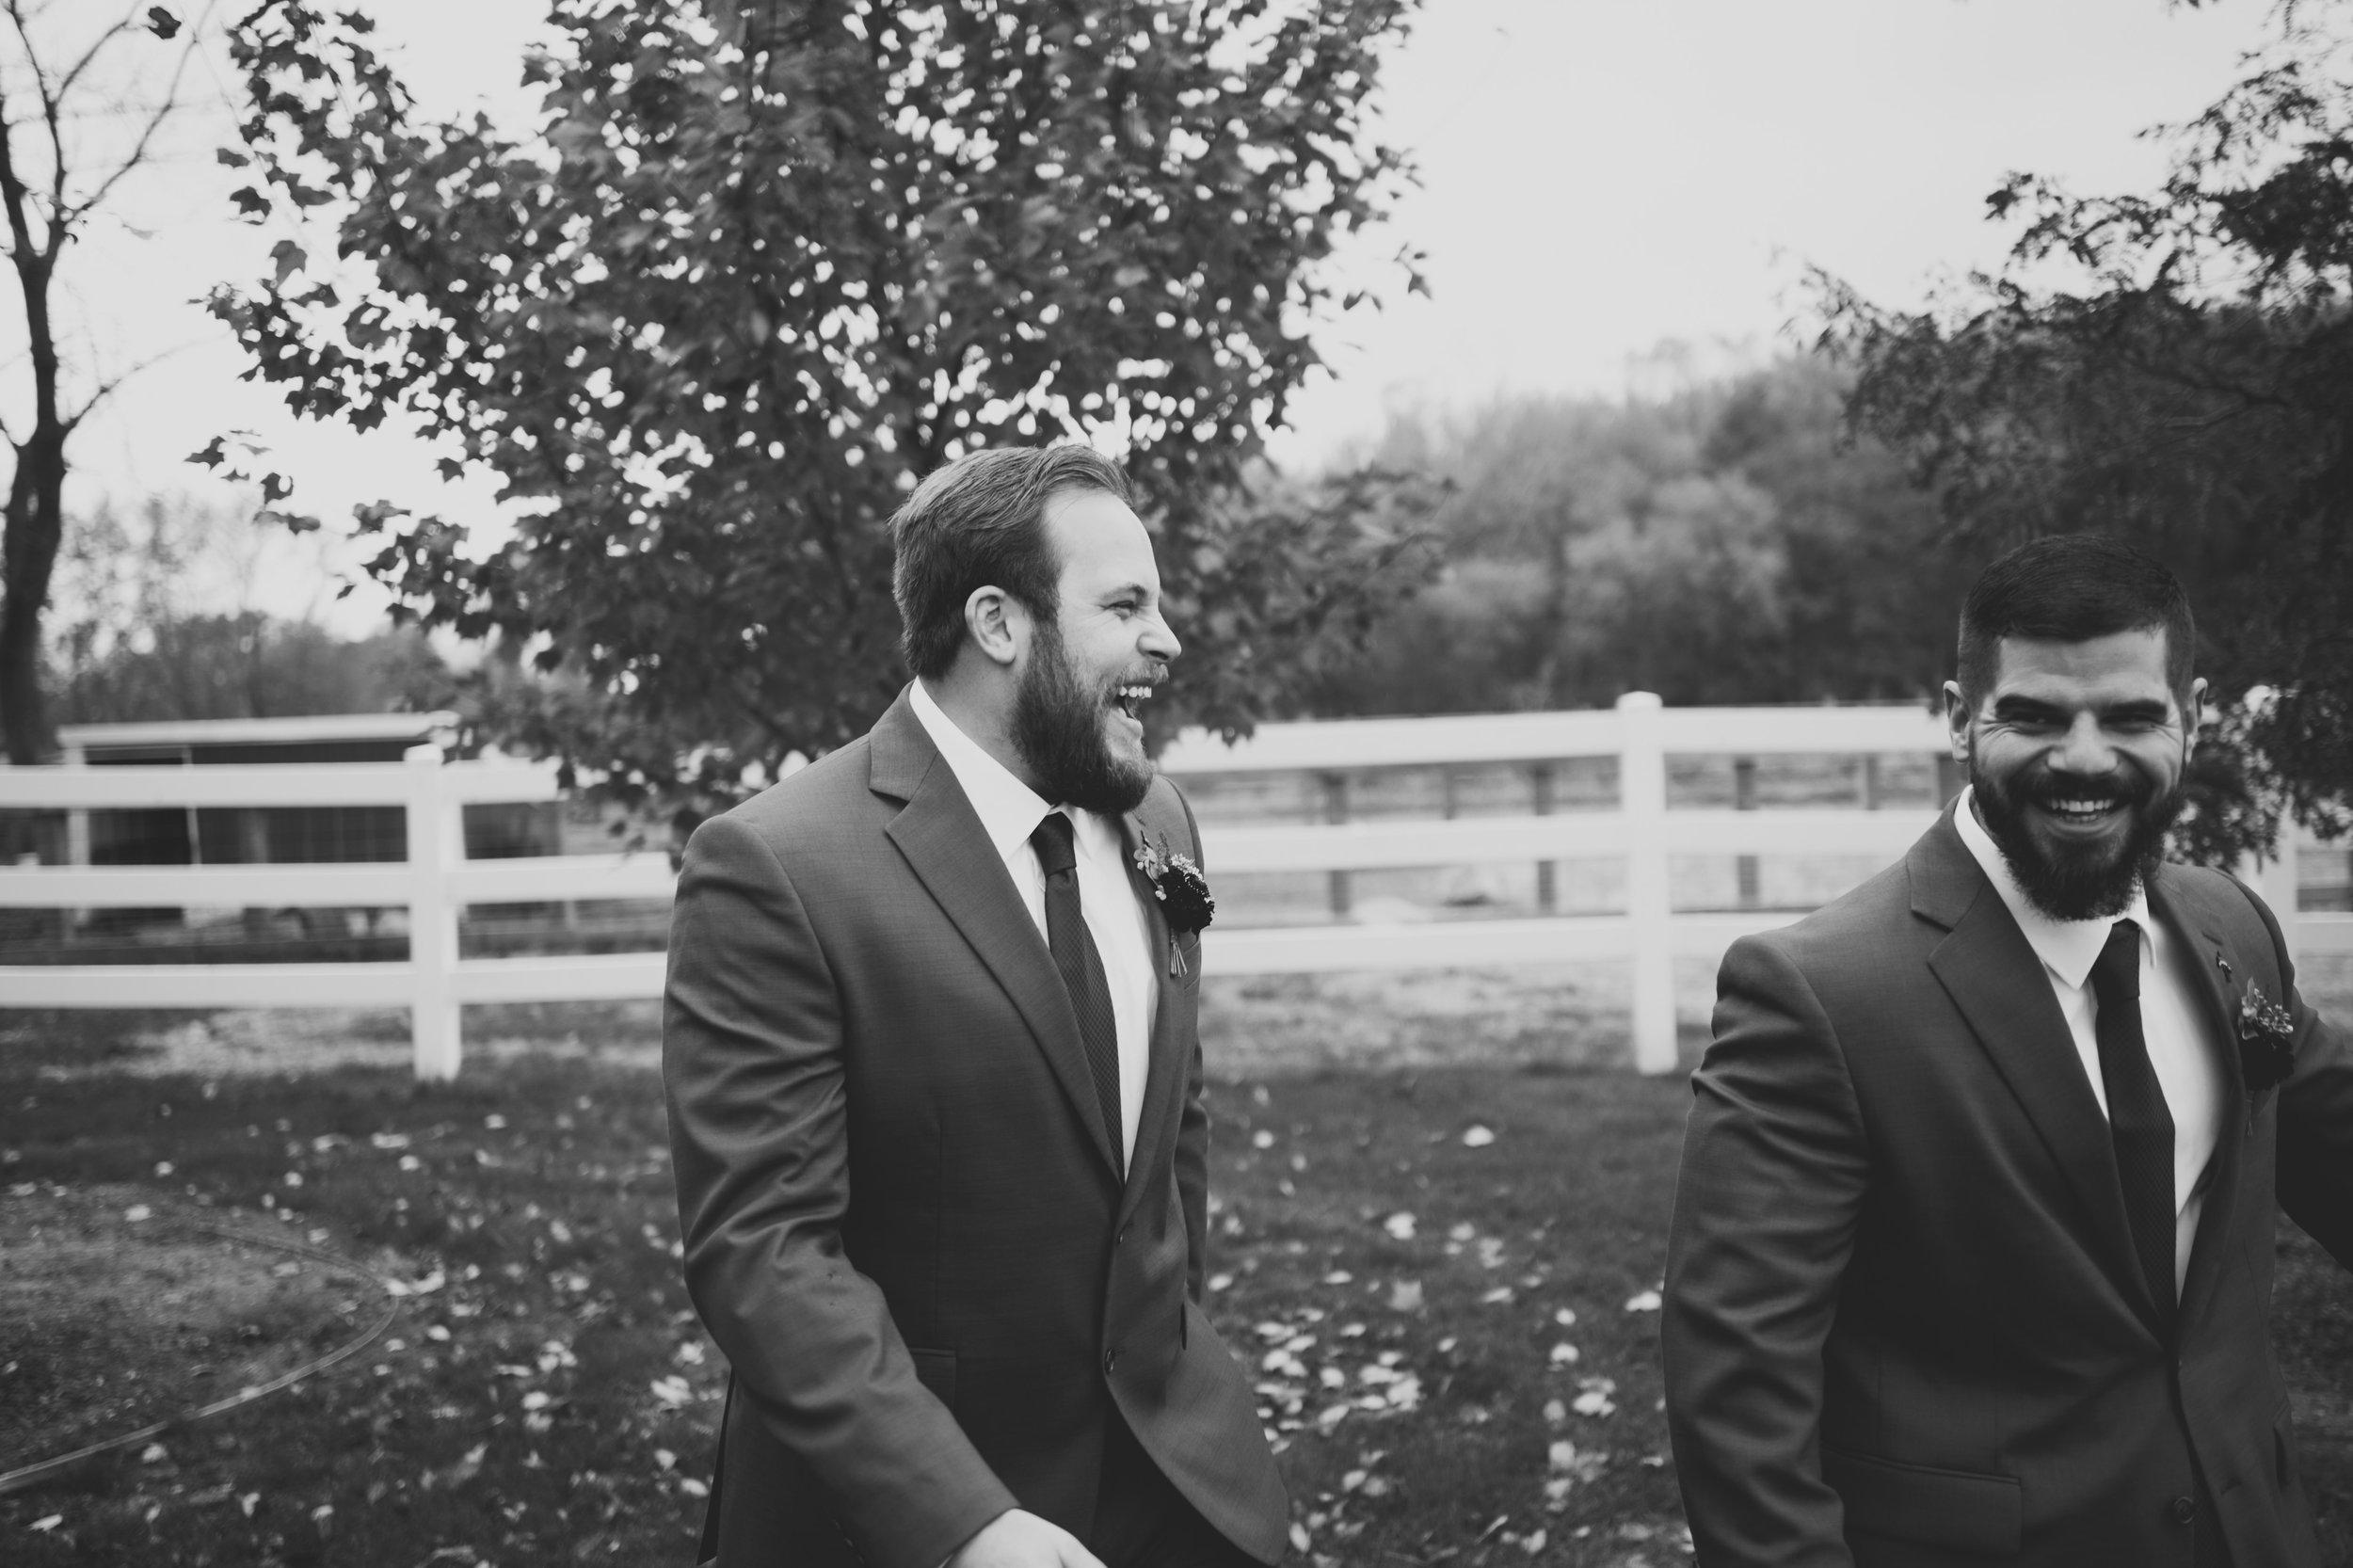 wildwoodfamilyfarms-wildwood farms-grand rapids-grand rapids wedding -grand rapids wedding photographer-wedding-wildwood farms wedding-michigan wedding-west michigan photographer-jessica darling-j darling photo-becca and josh wedding 036.jpg